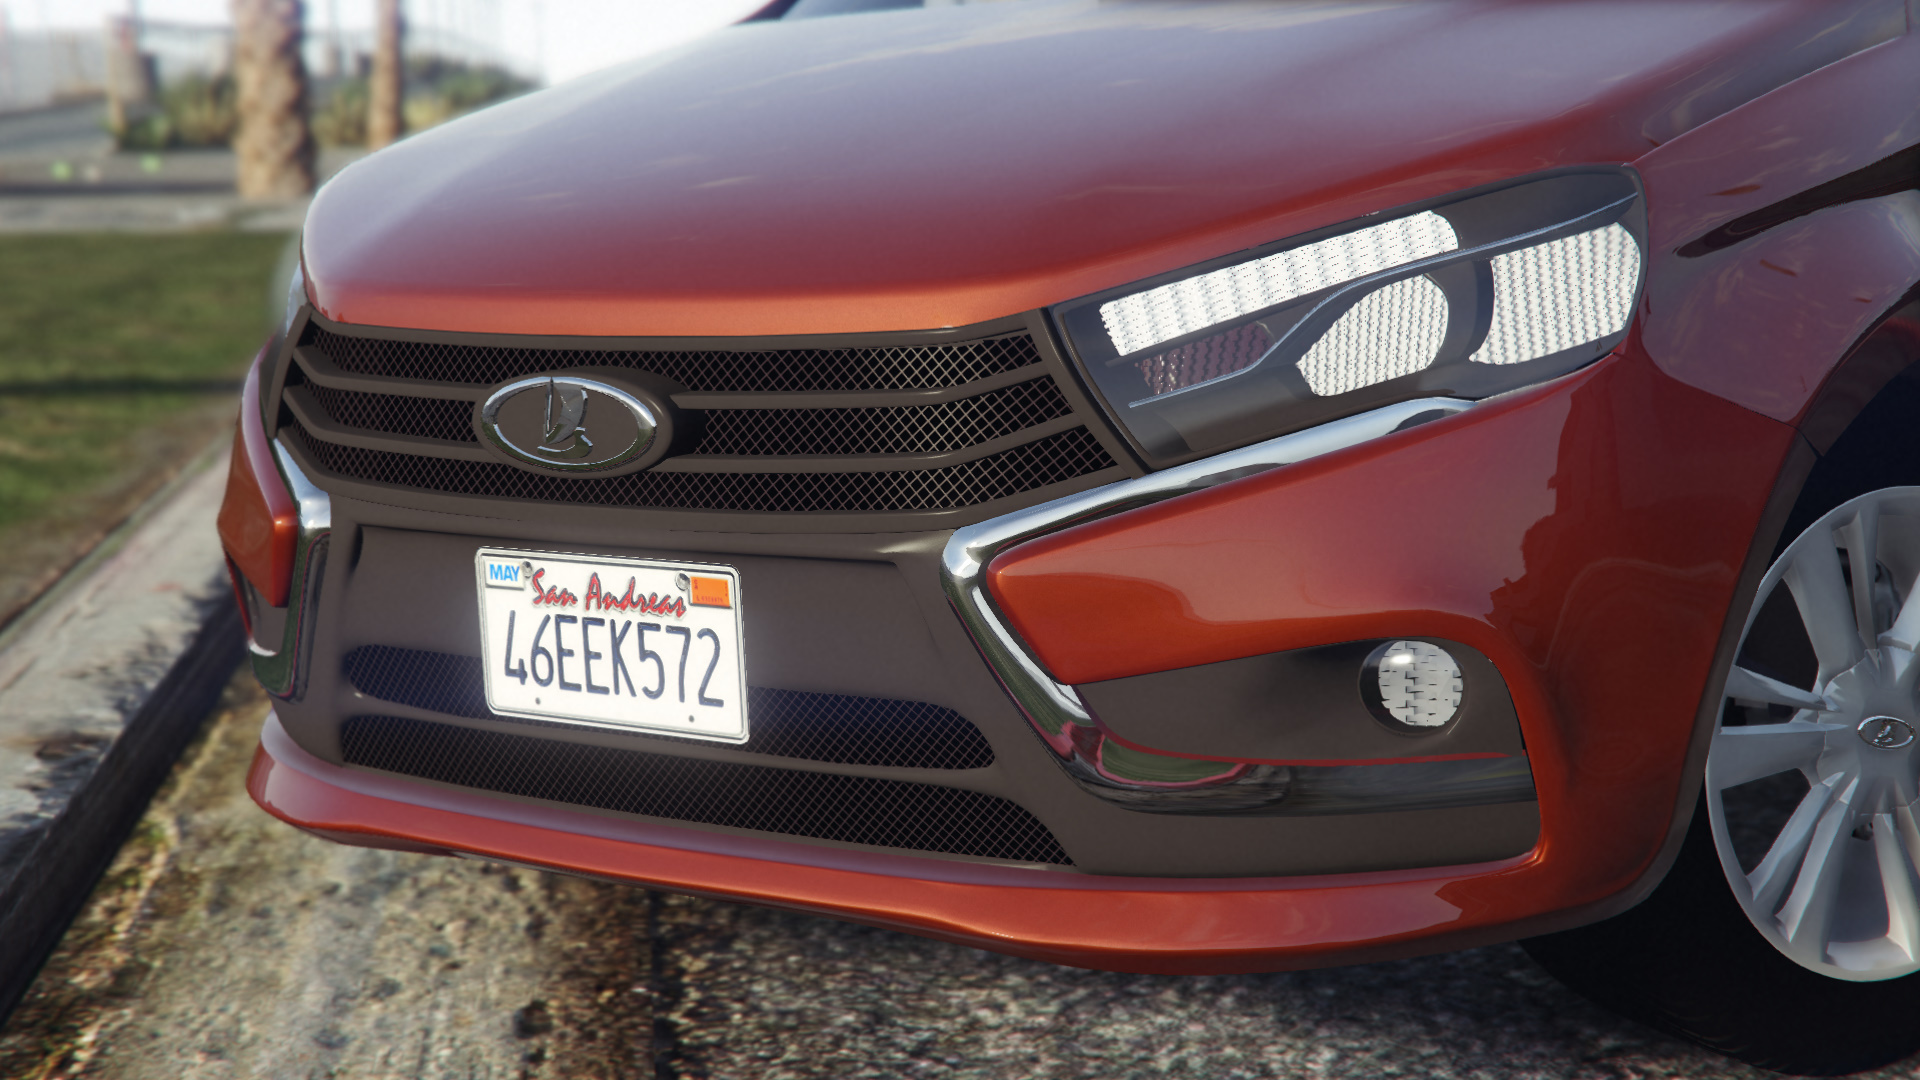 2015 Lada Vesta для GTA V - Скриншот 1